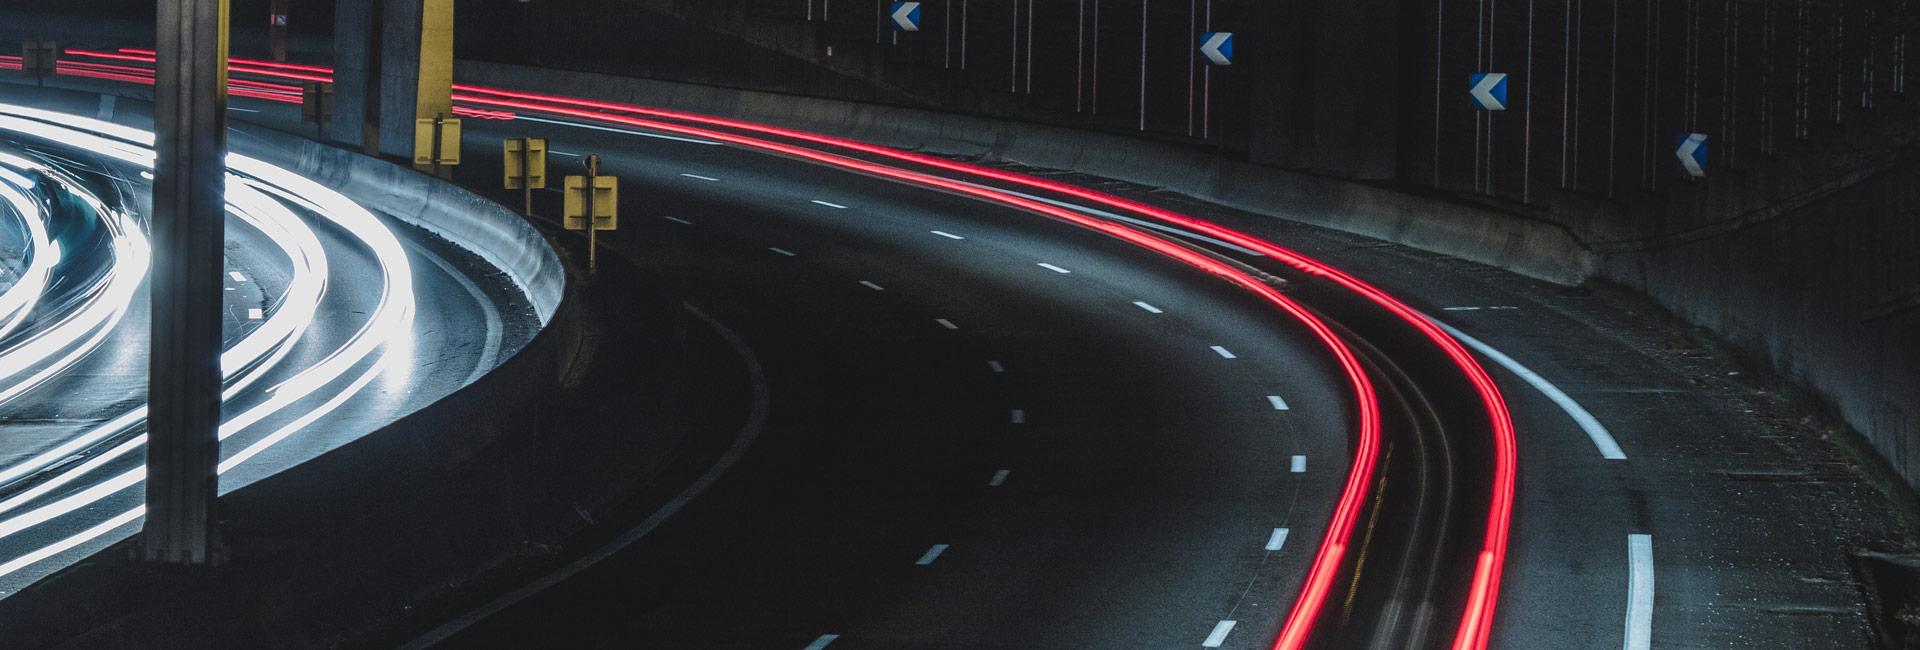 Full Hero - Automotive & Industry